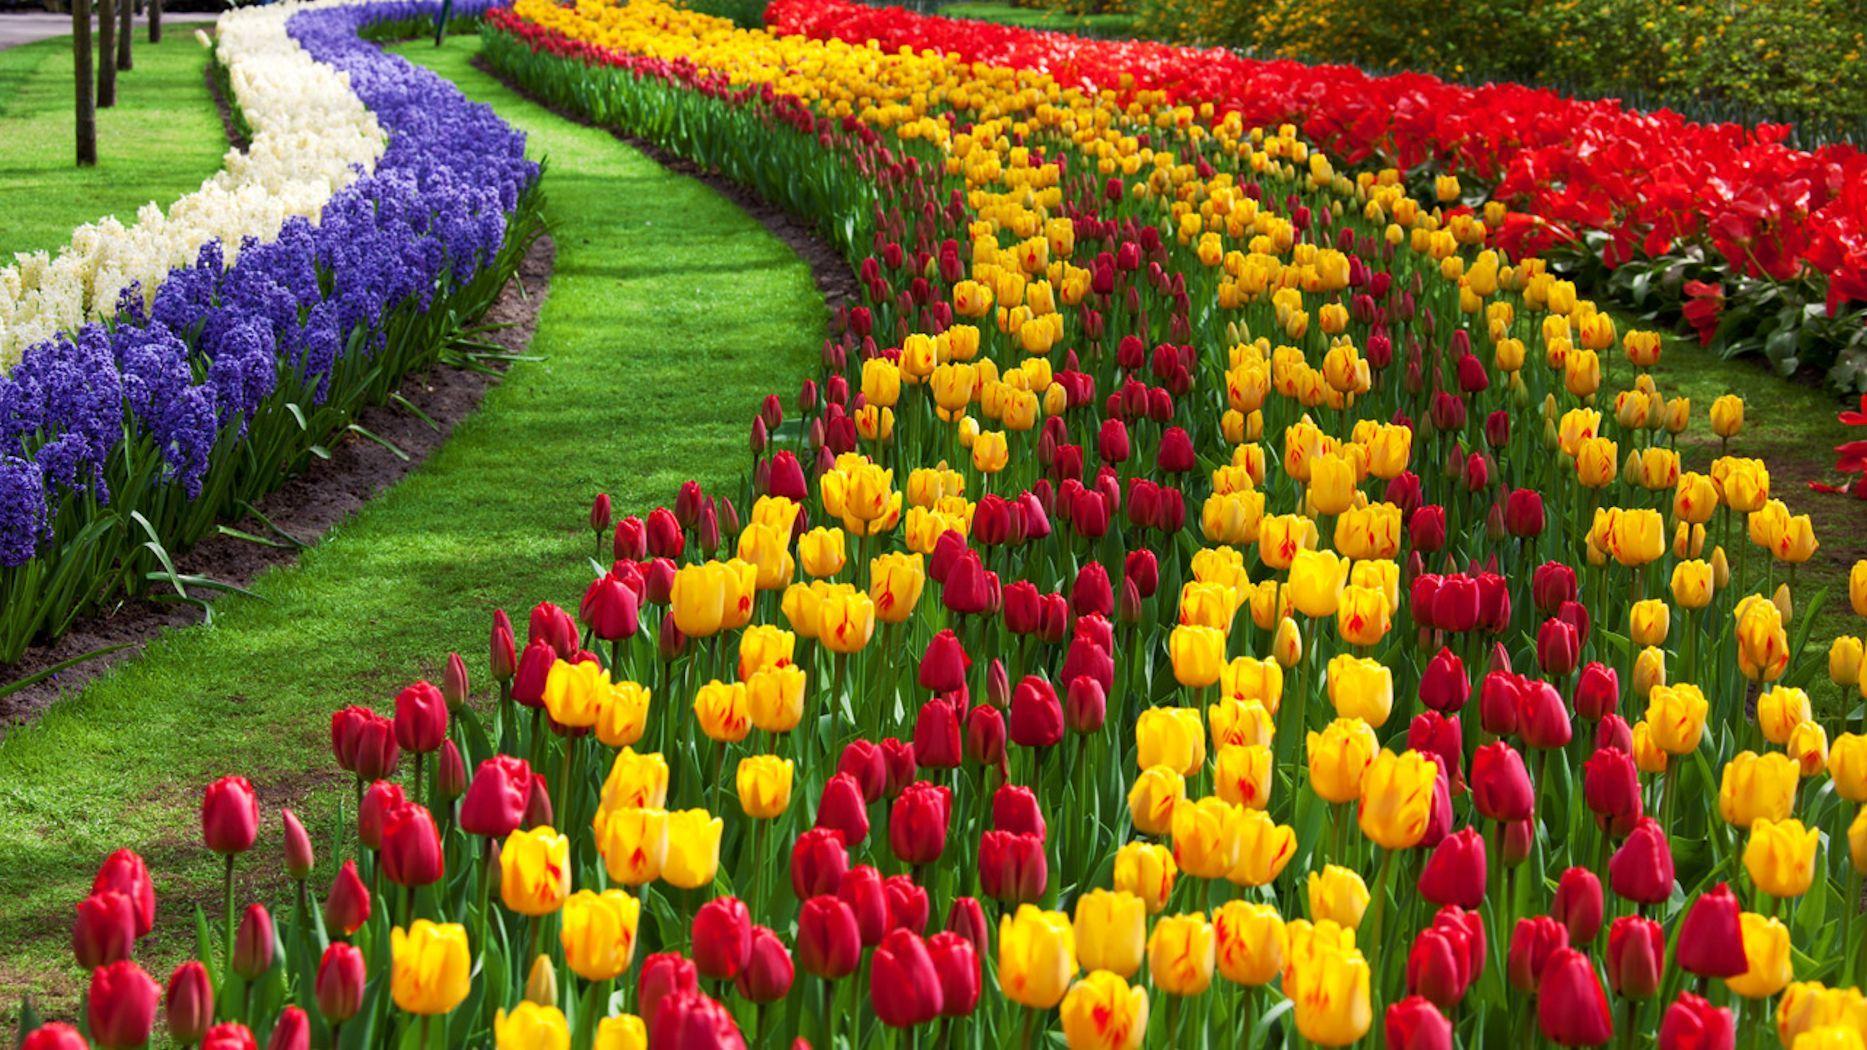 The Tulip Festival Flowers Garden Layout Tulips Garden Garden Images